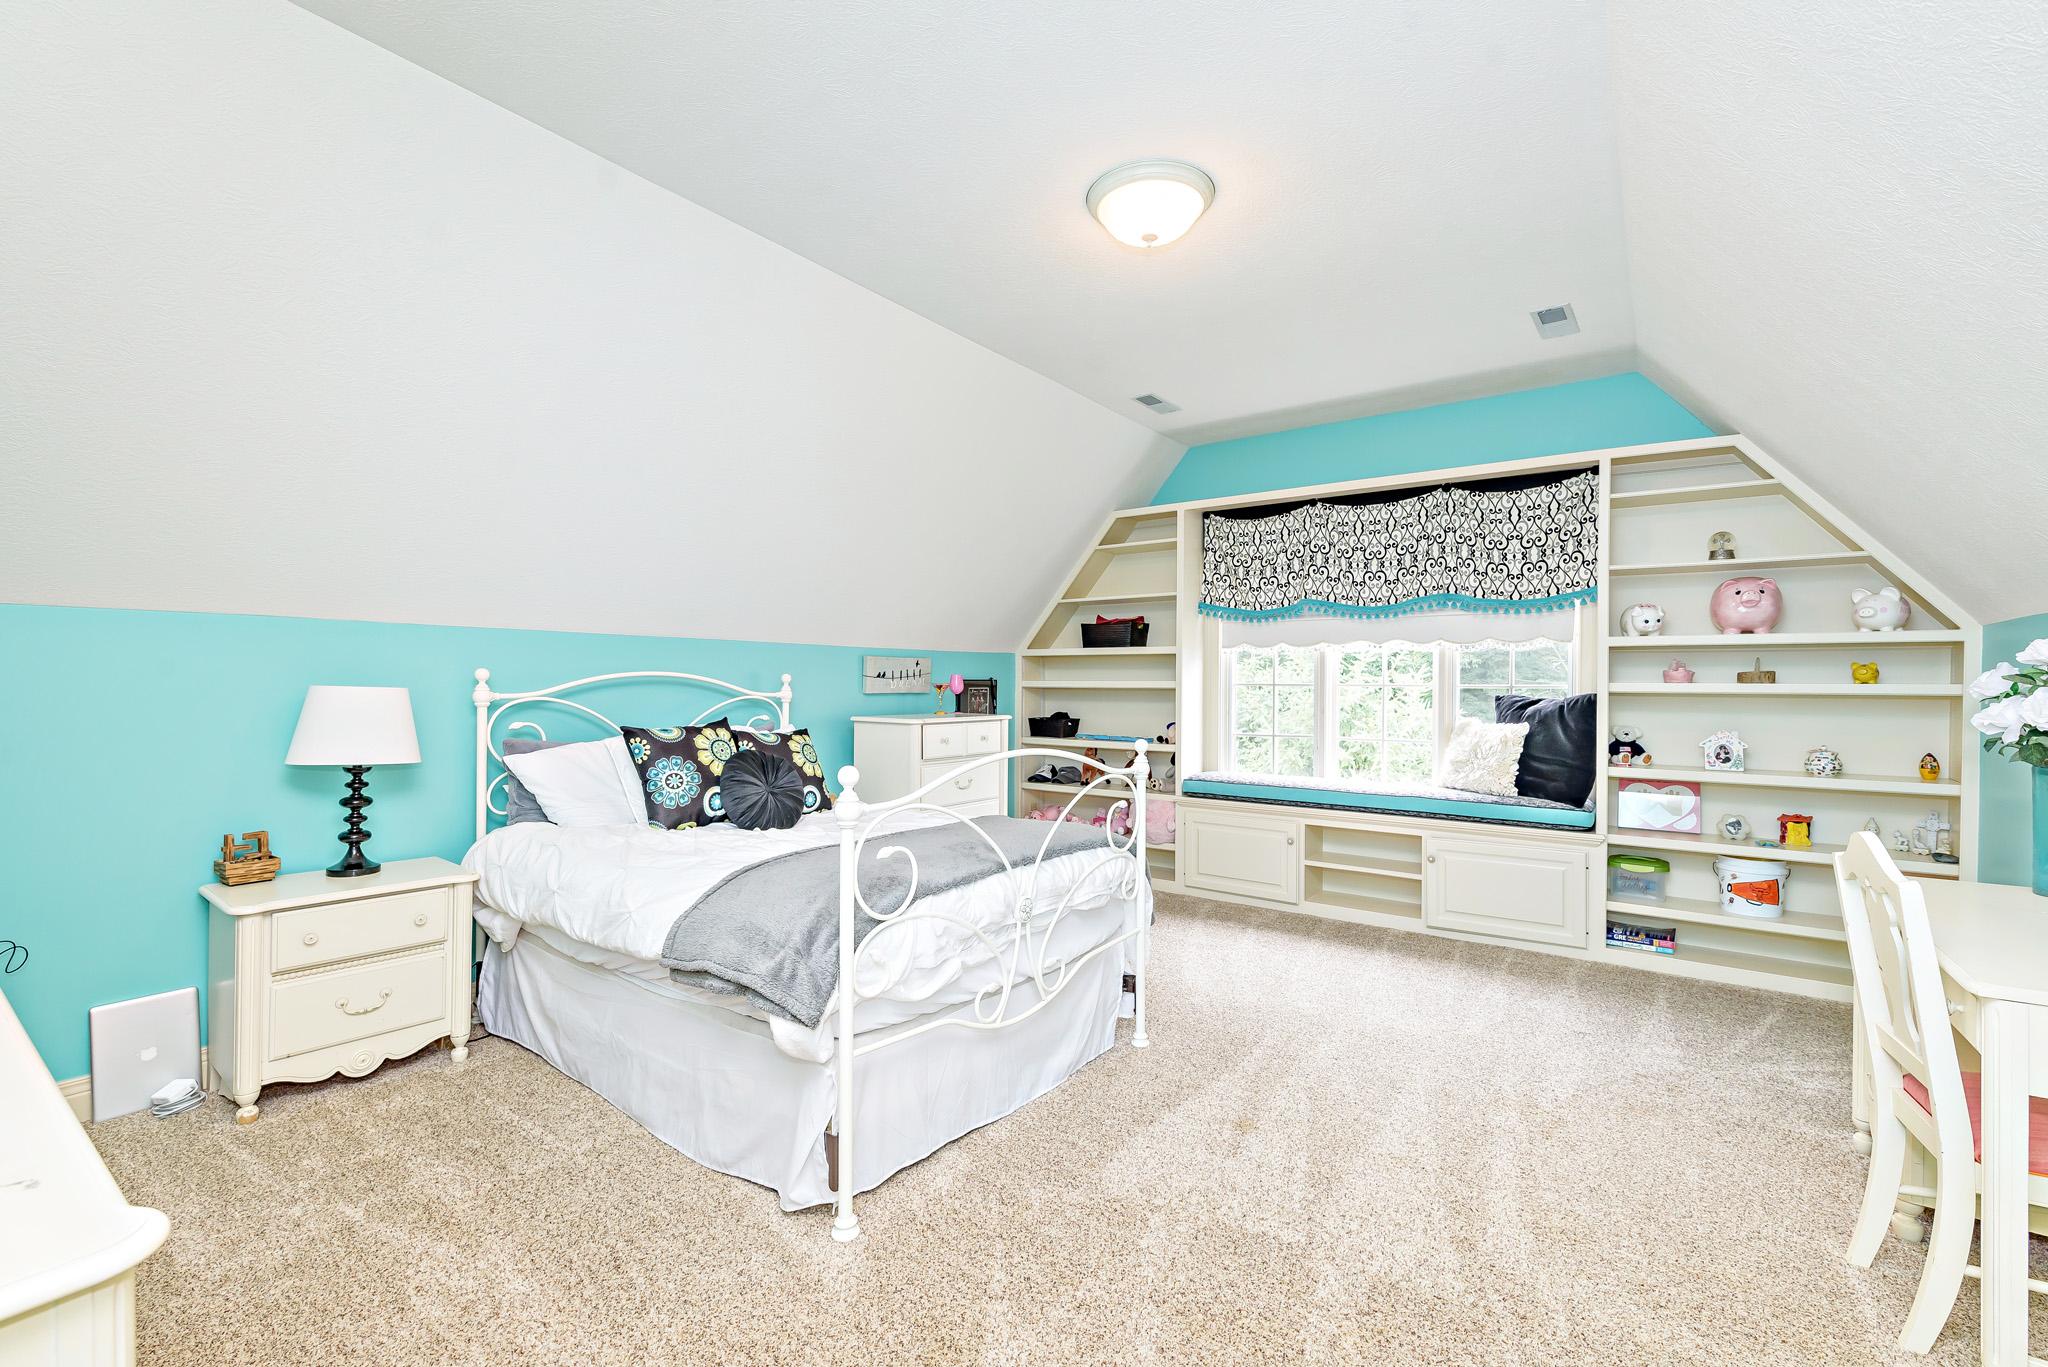 27_Bedroom 2.jpg